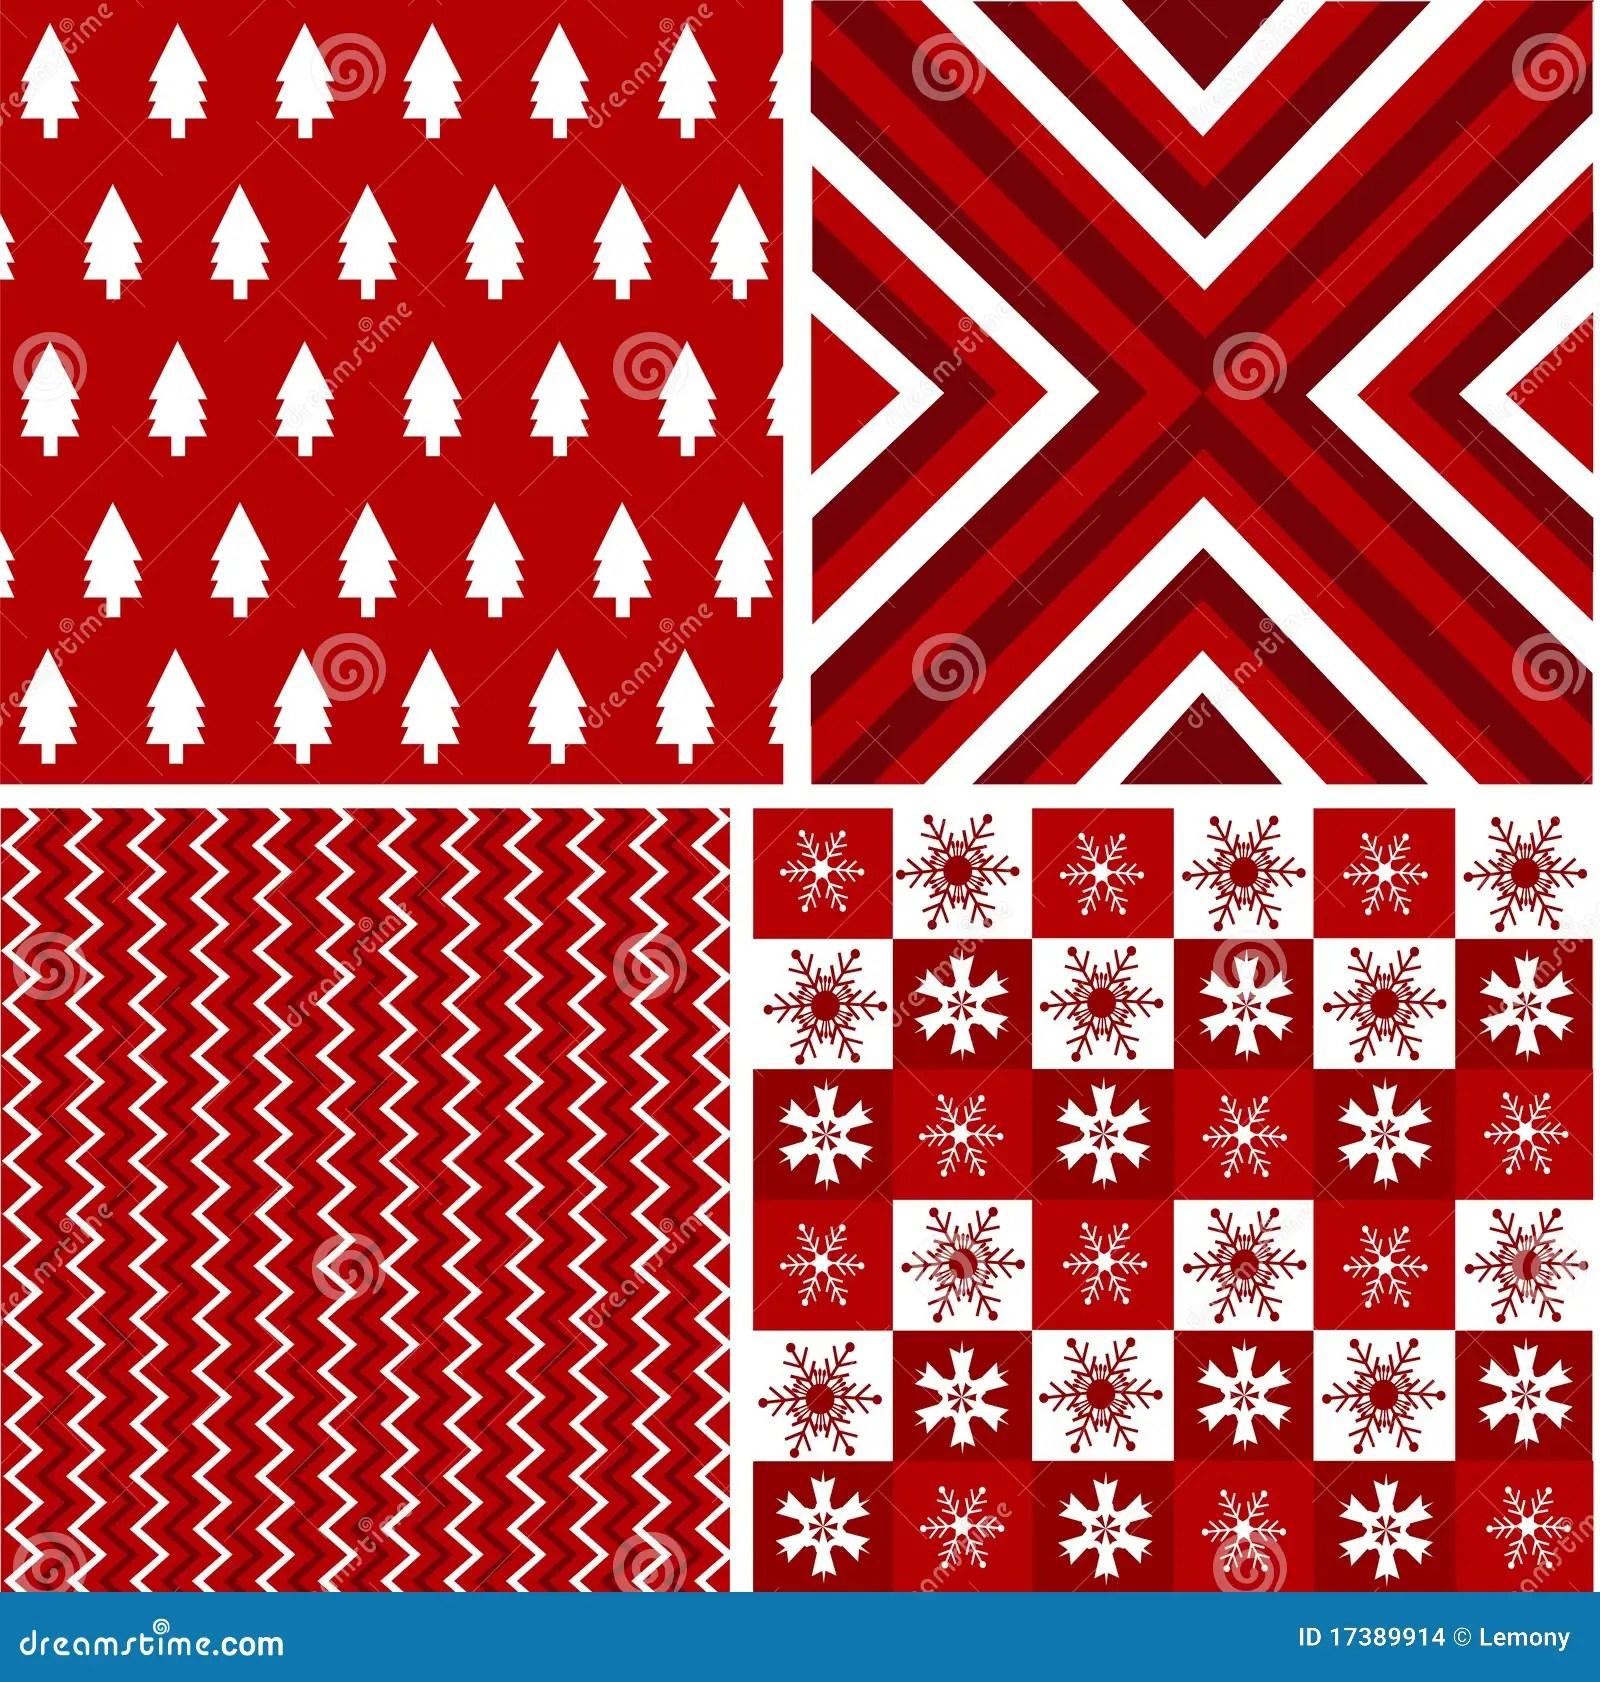 Black Plaid Wallpaper Seamless Patterns Christmas Fabric Texture Stock Vector